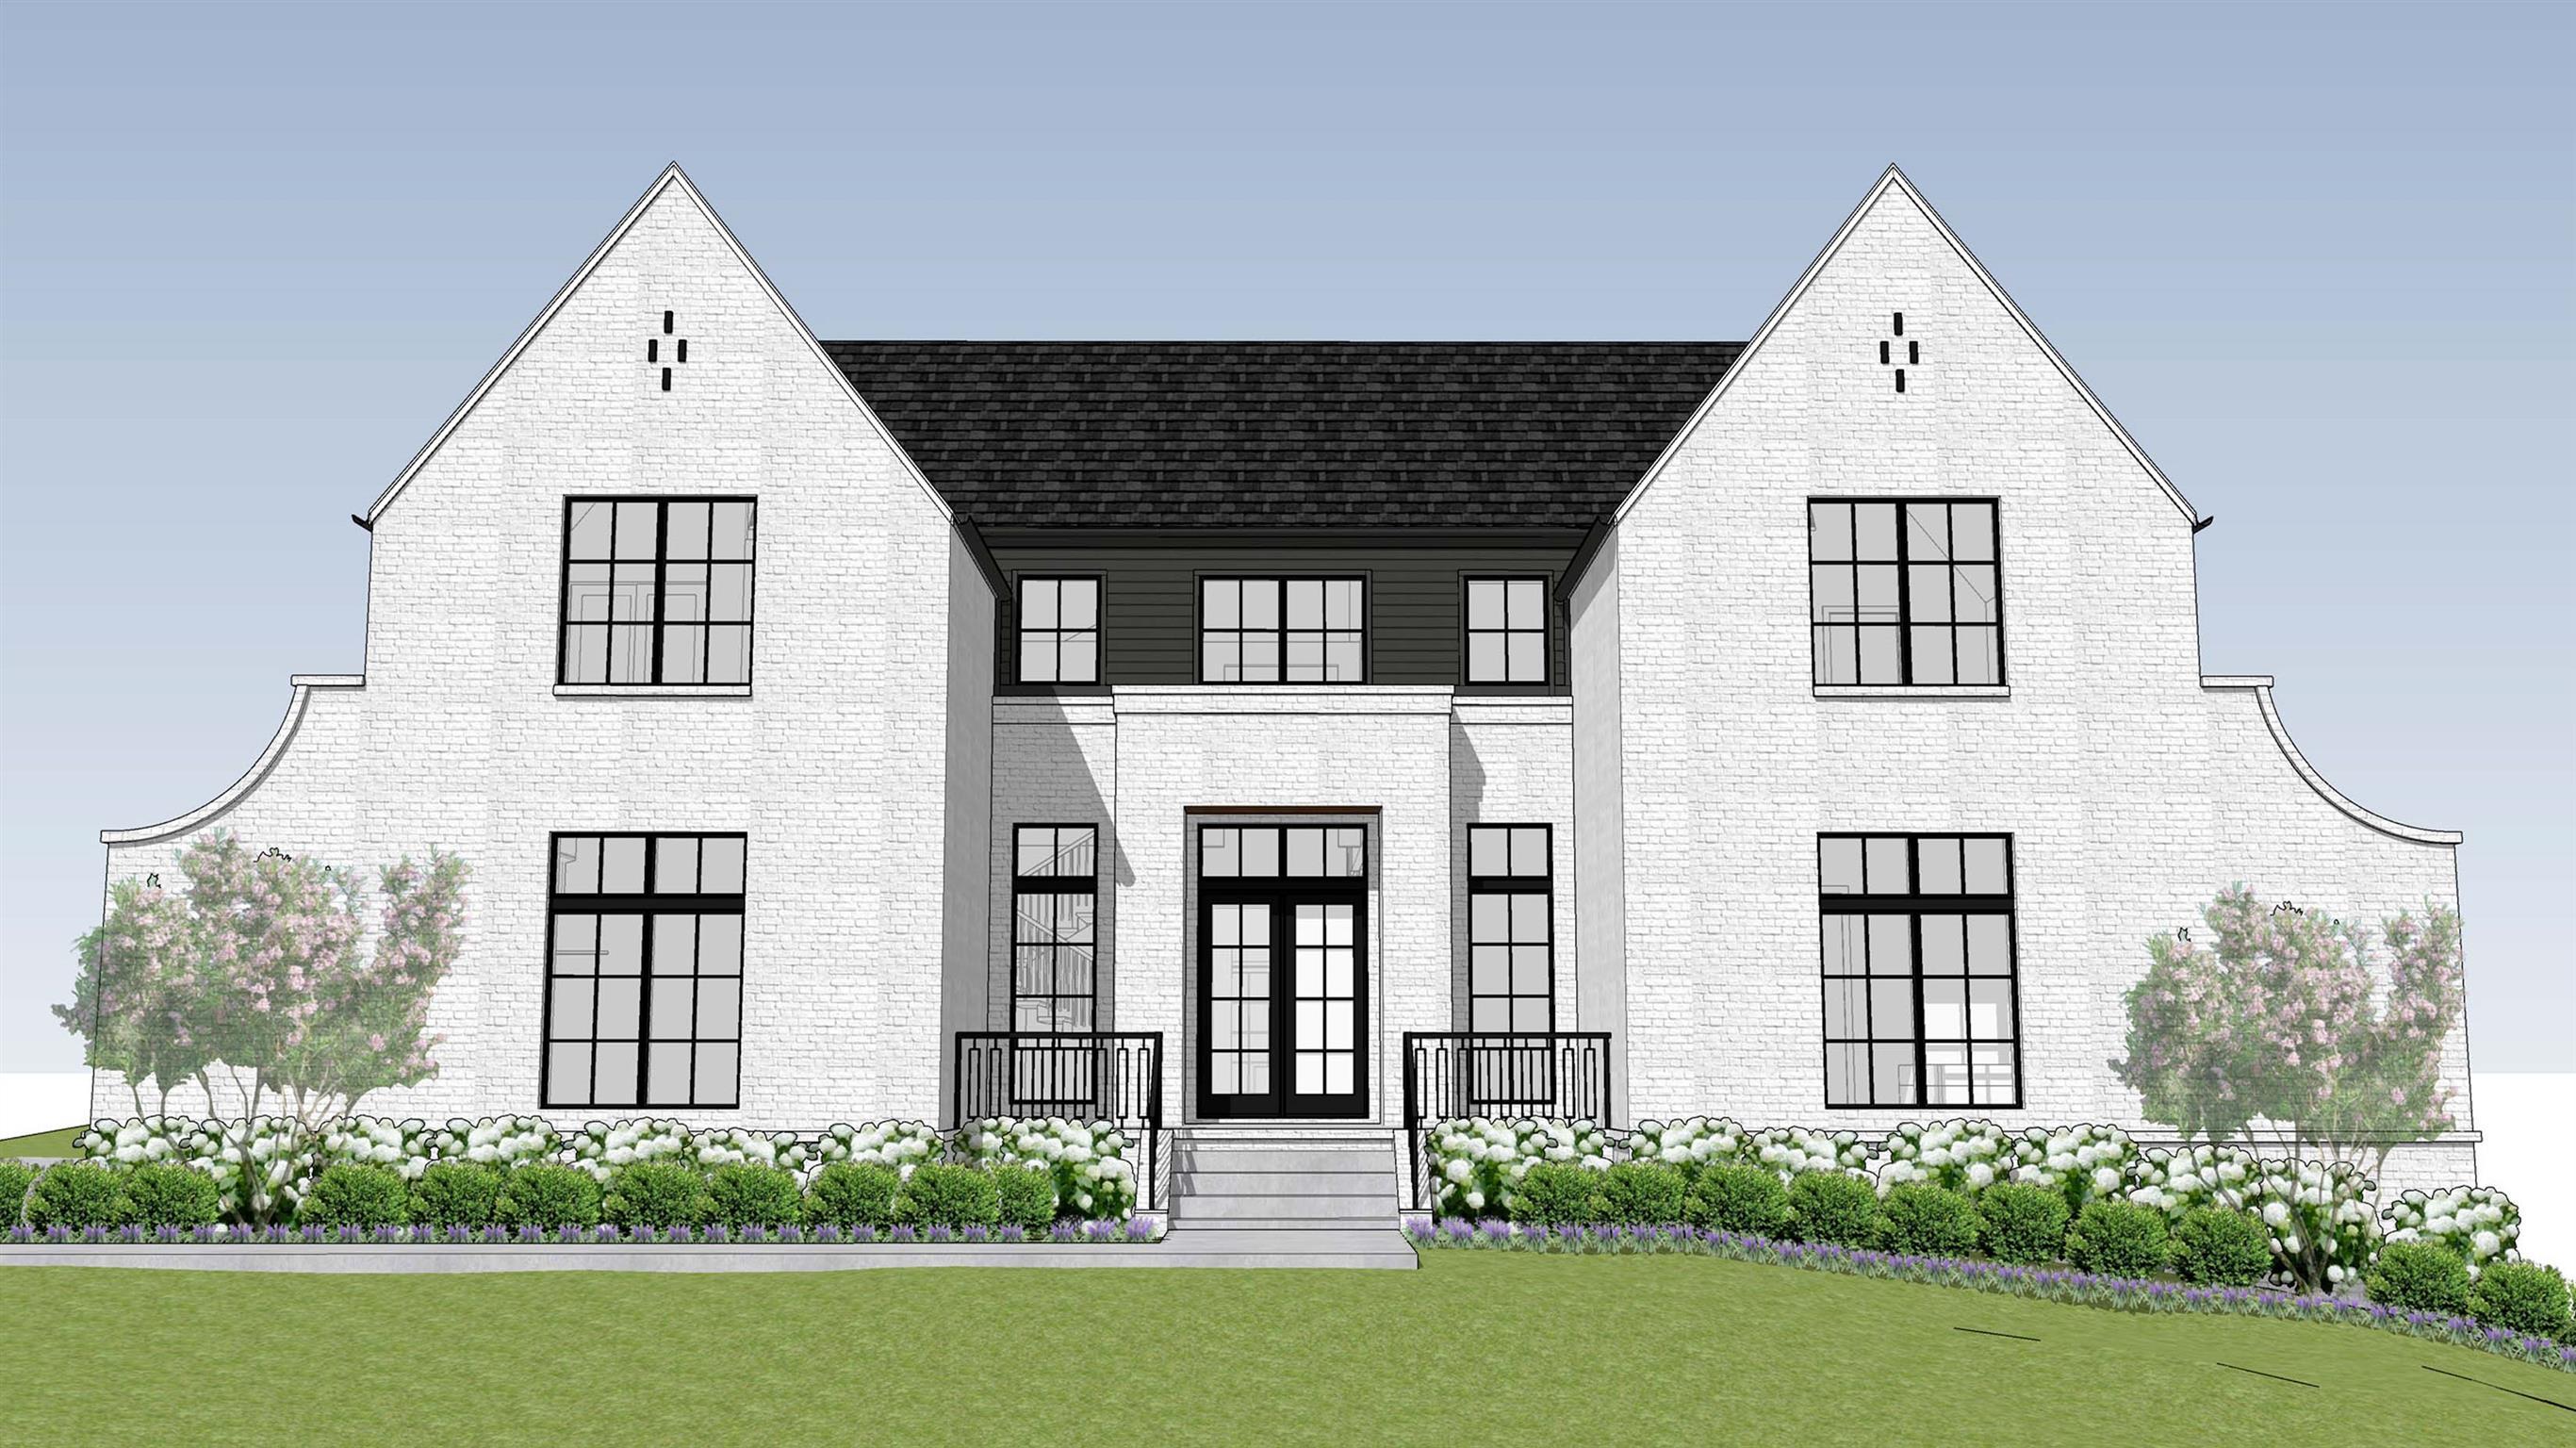 107 W Tyne Dr, Nashville, TN 37205 - Nashville, TN real estate listing